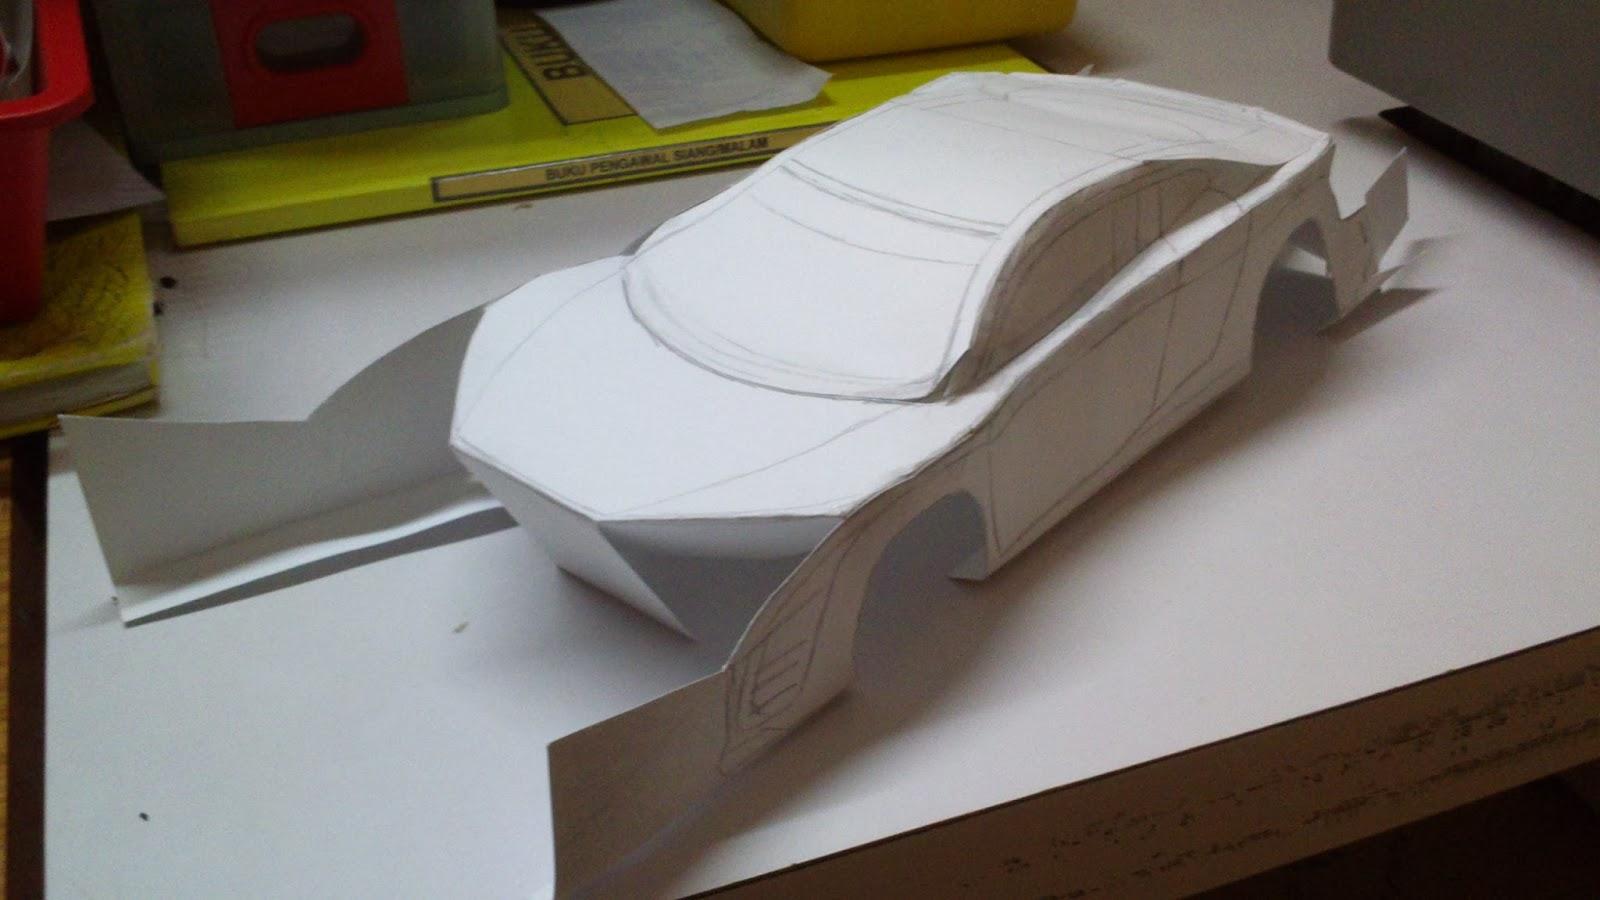 paper car project - Gecce.tackletarts.co